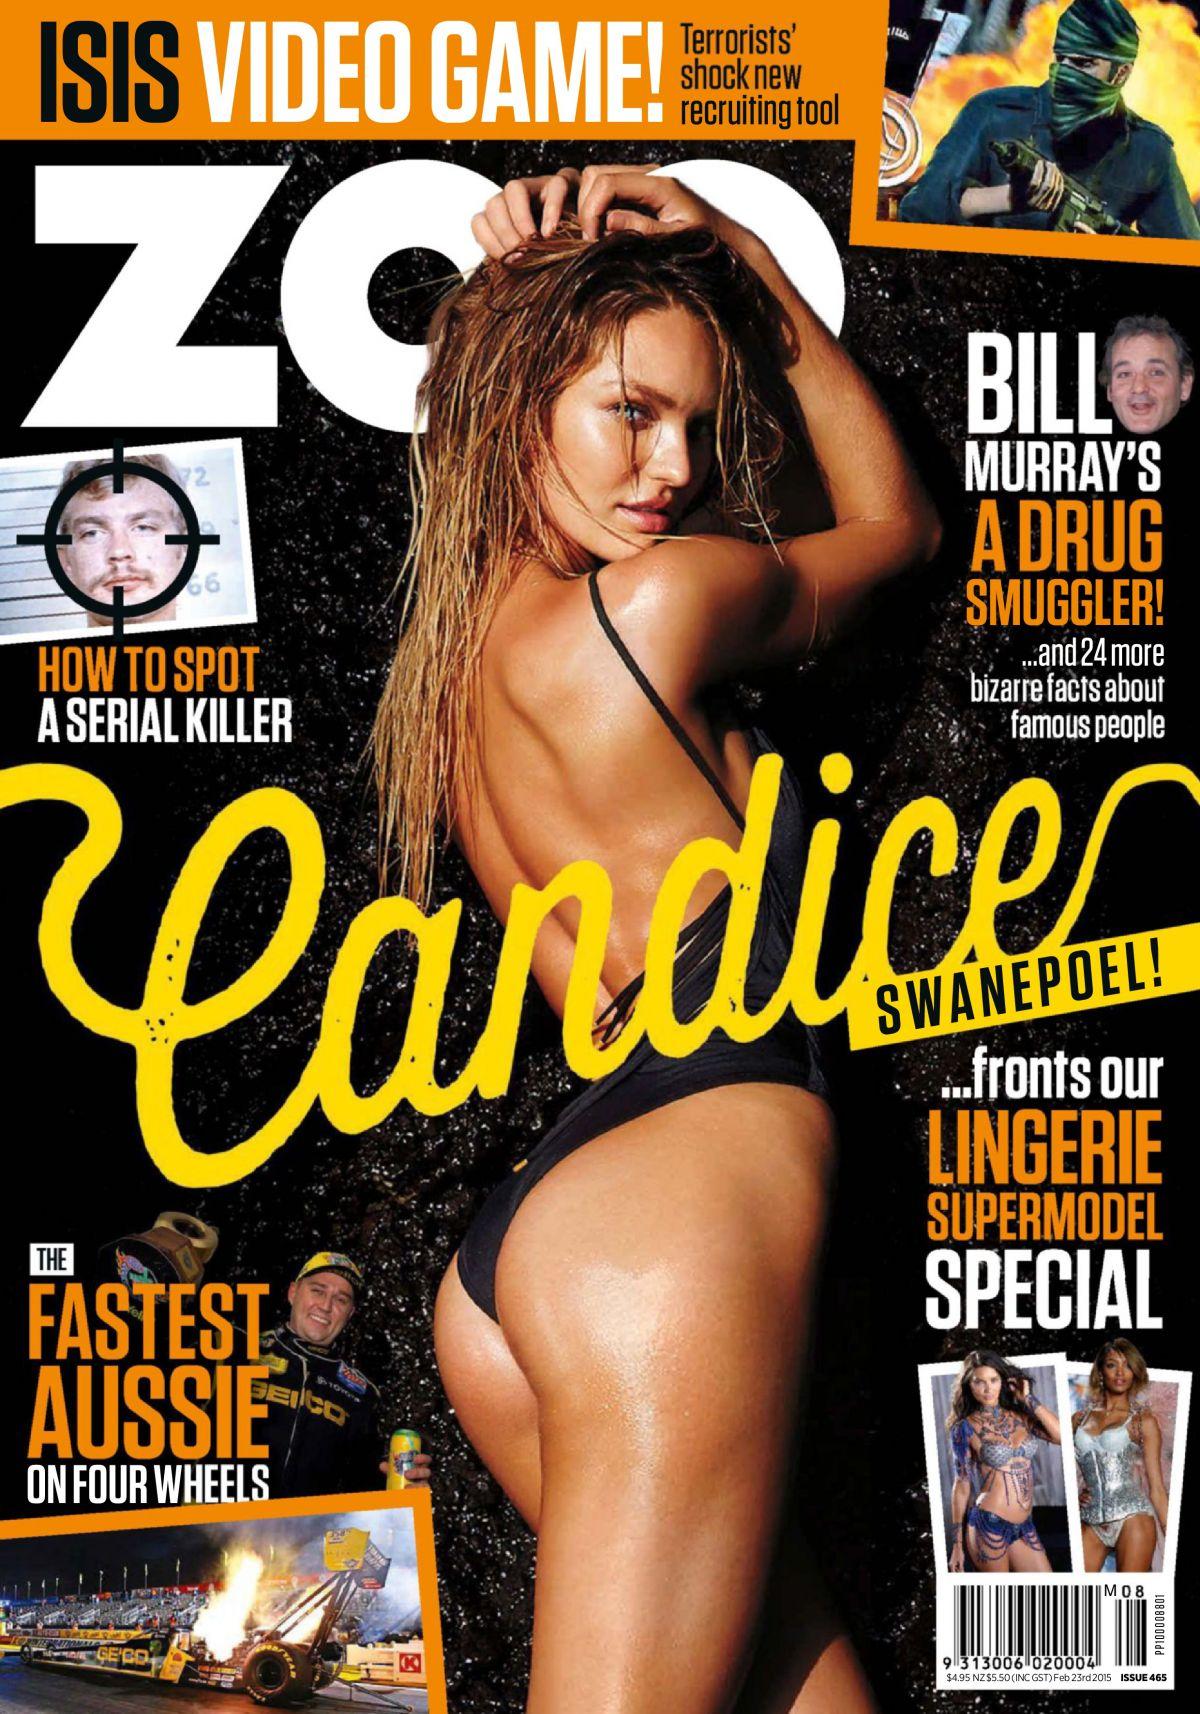 CANDICE SWANEPOEL in Zoo Mafazine, Australia February 2015 Issue